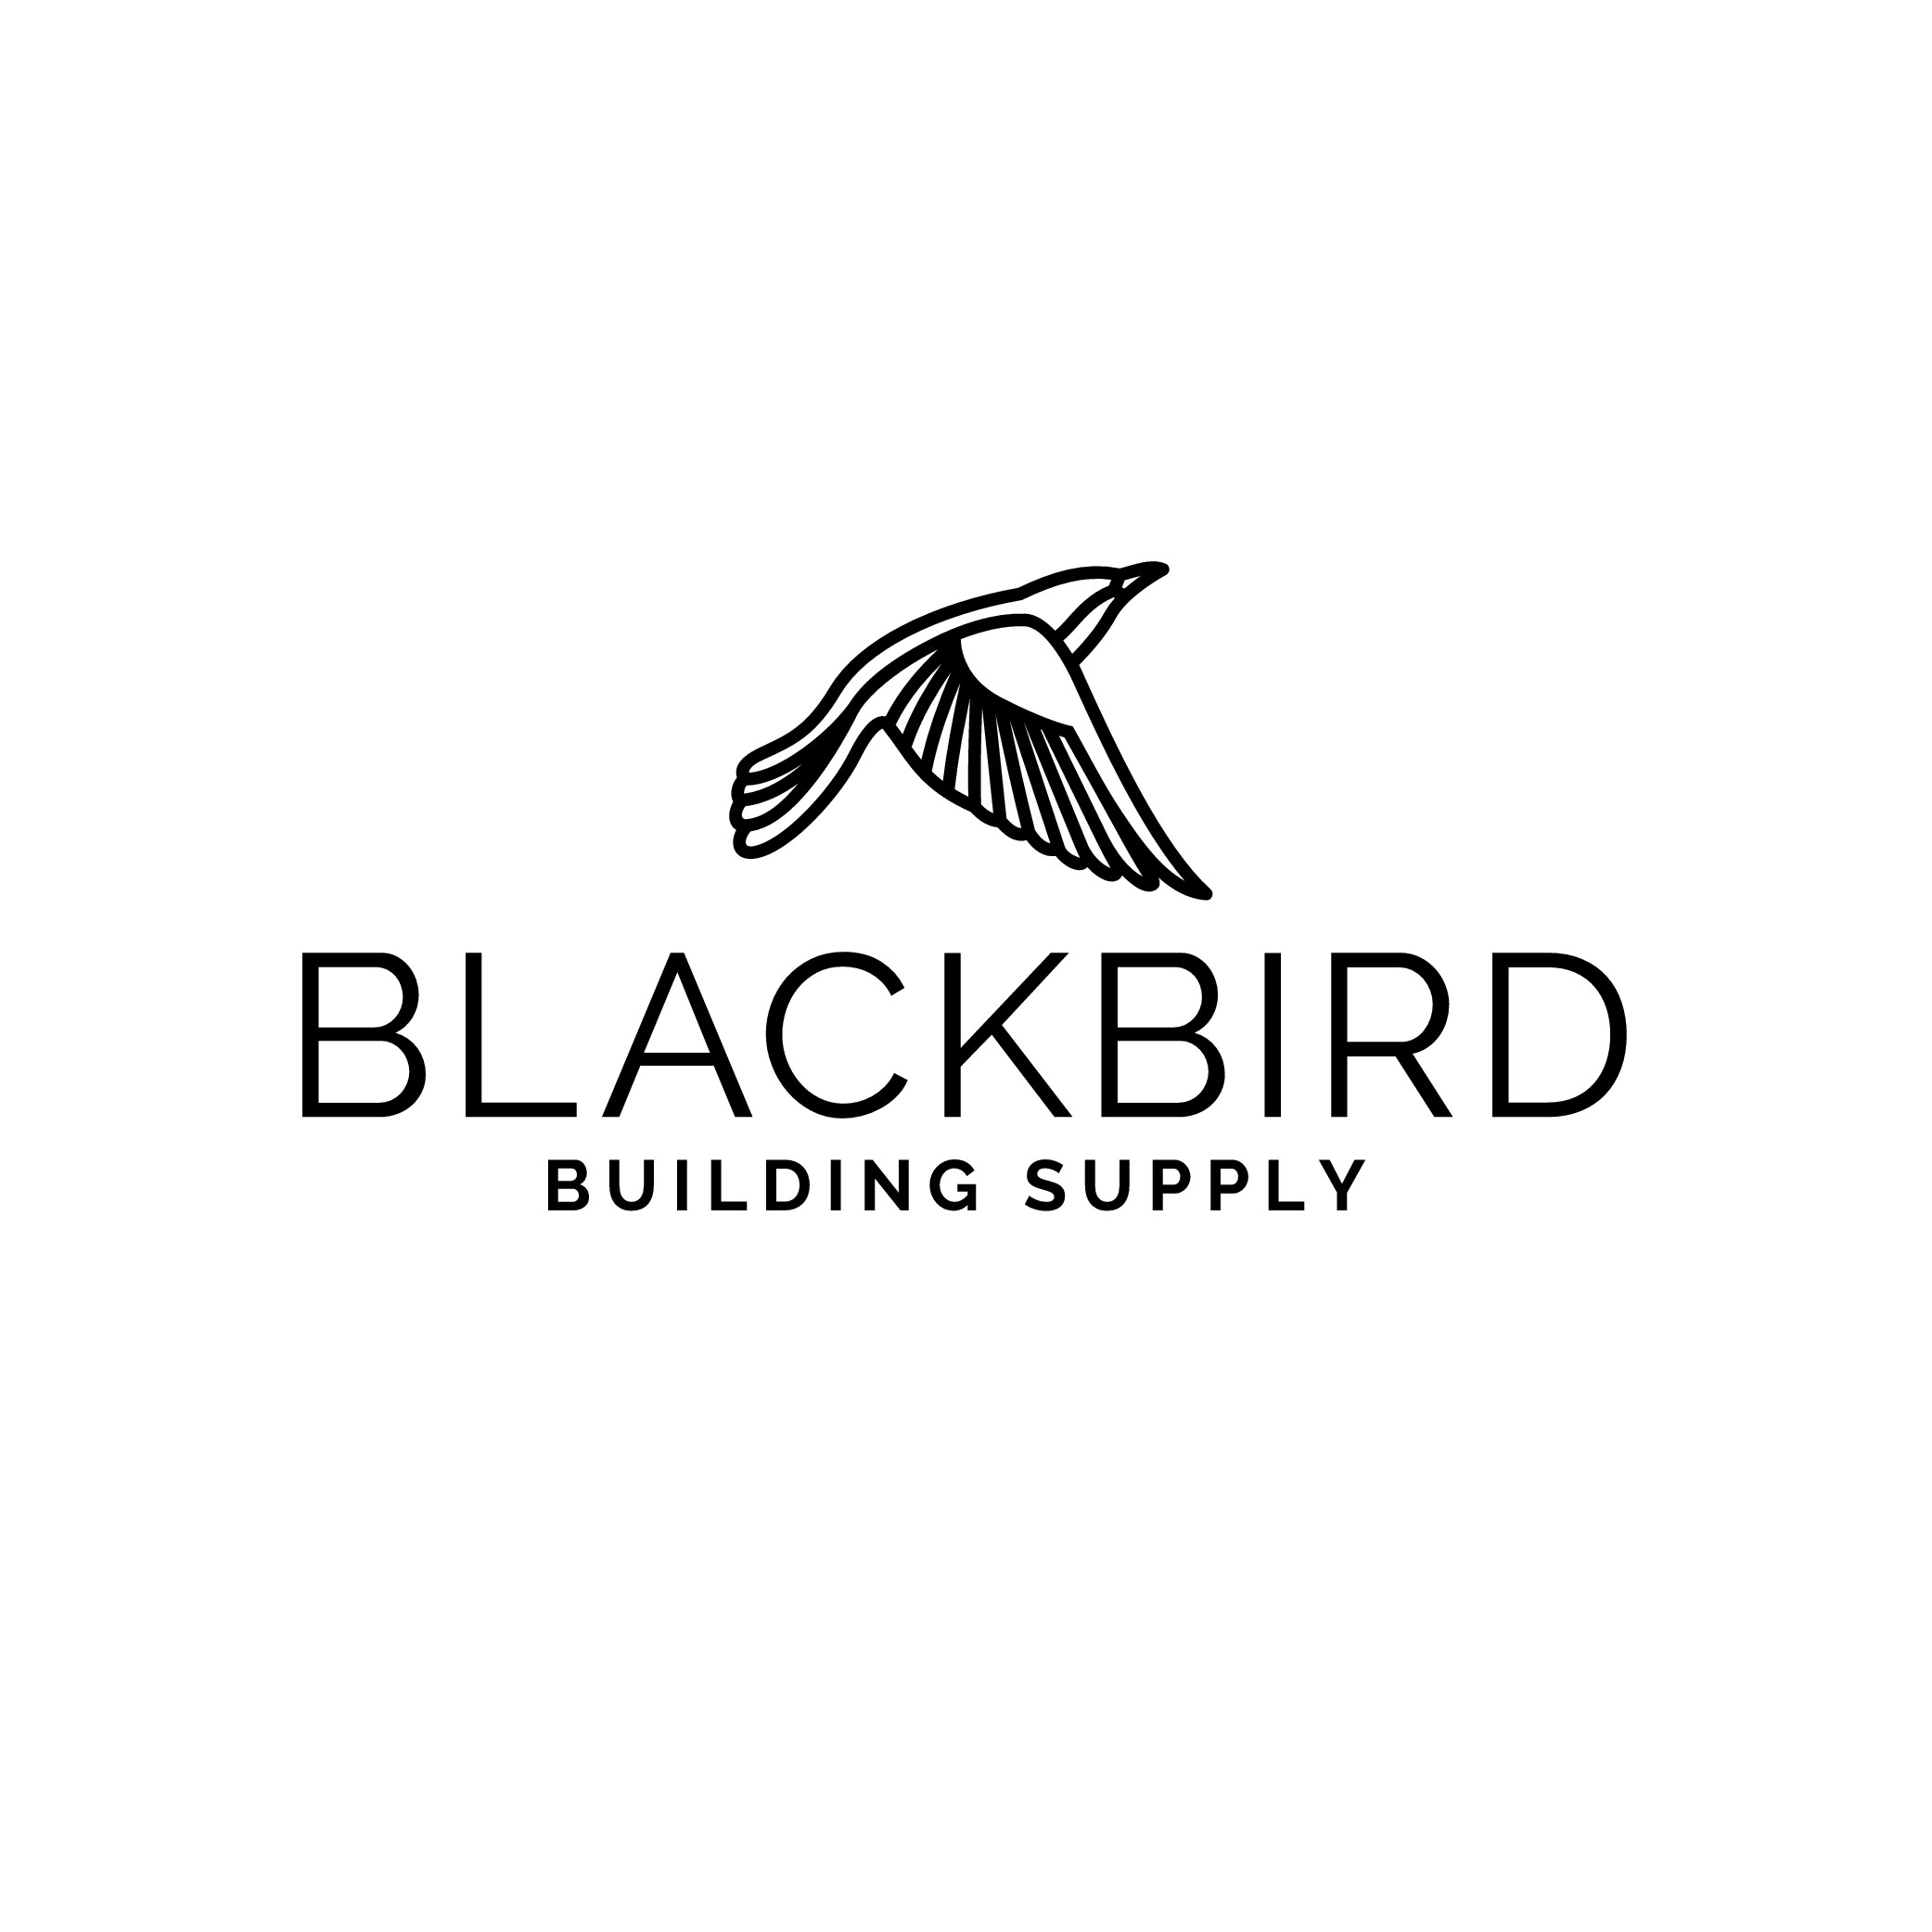 Blackbird Building Supply needs a classic, sophisticated logo